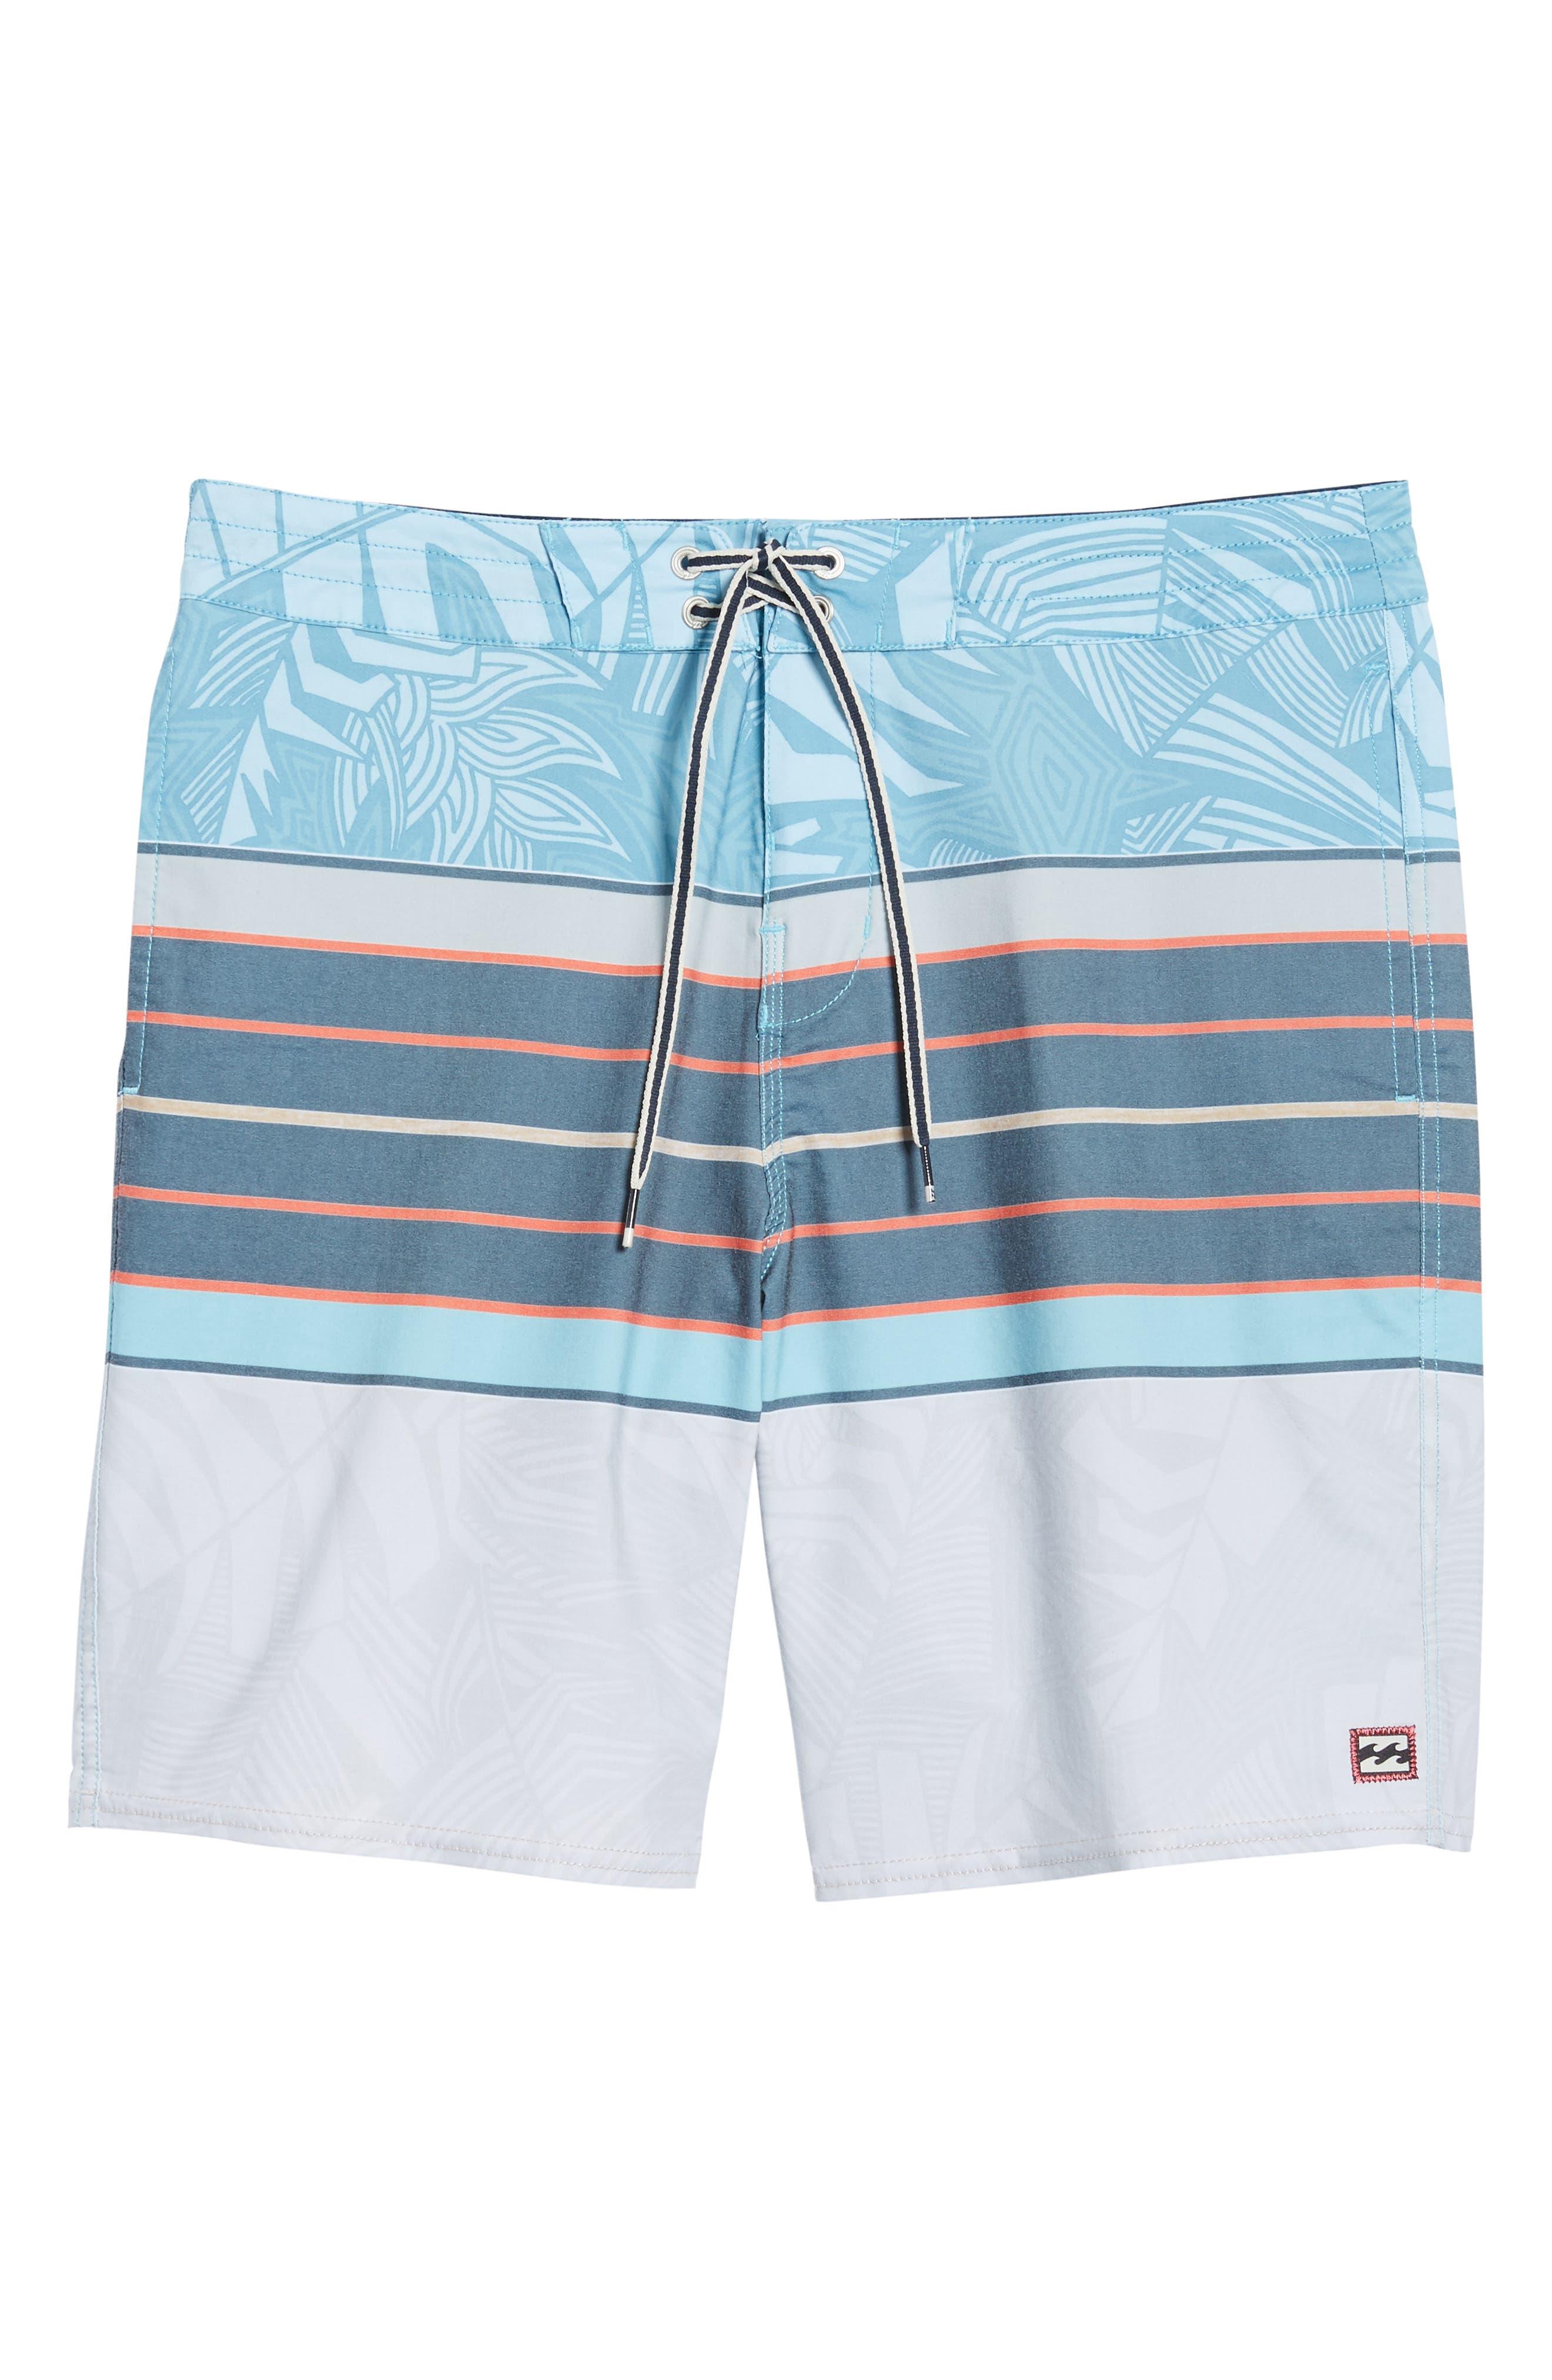 Stringer Lo Tides Board Shorts,                             Alternate thumbnail 6, color,                             Blue